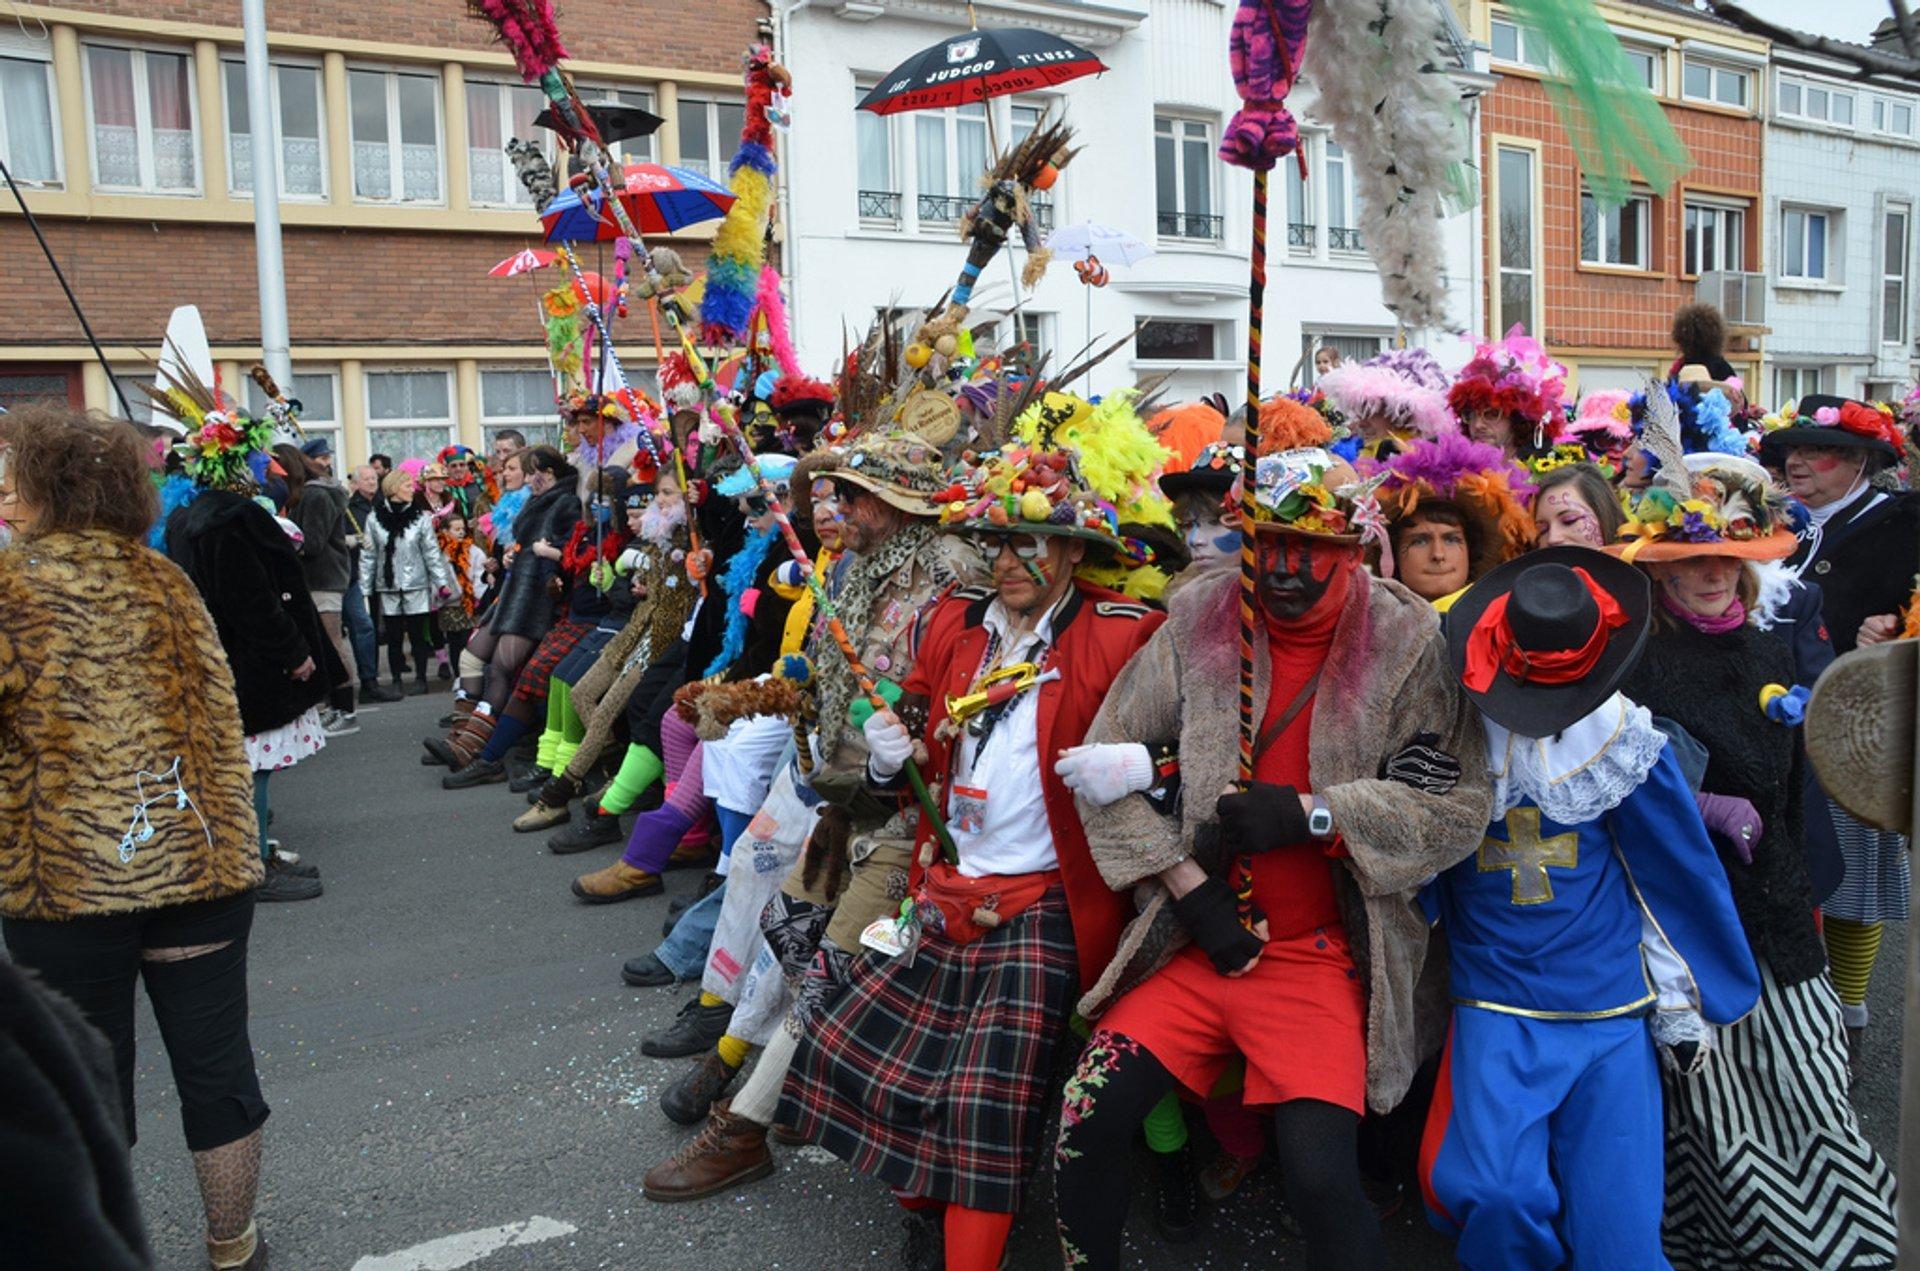 Dunkirk Carnival – Carnaval de Dunkerque